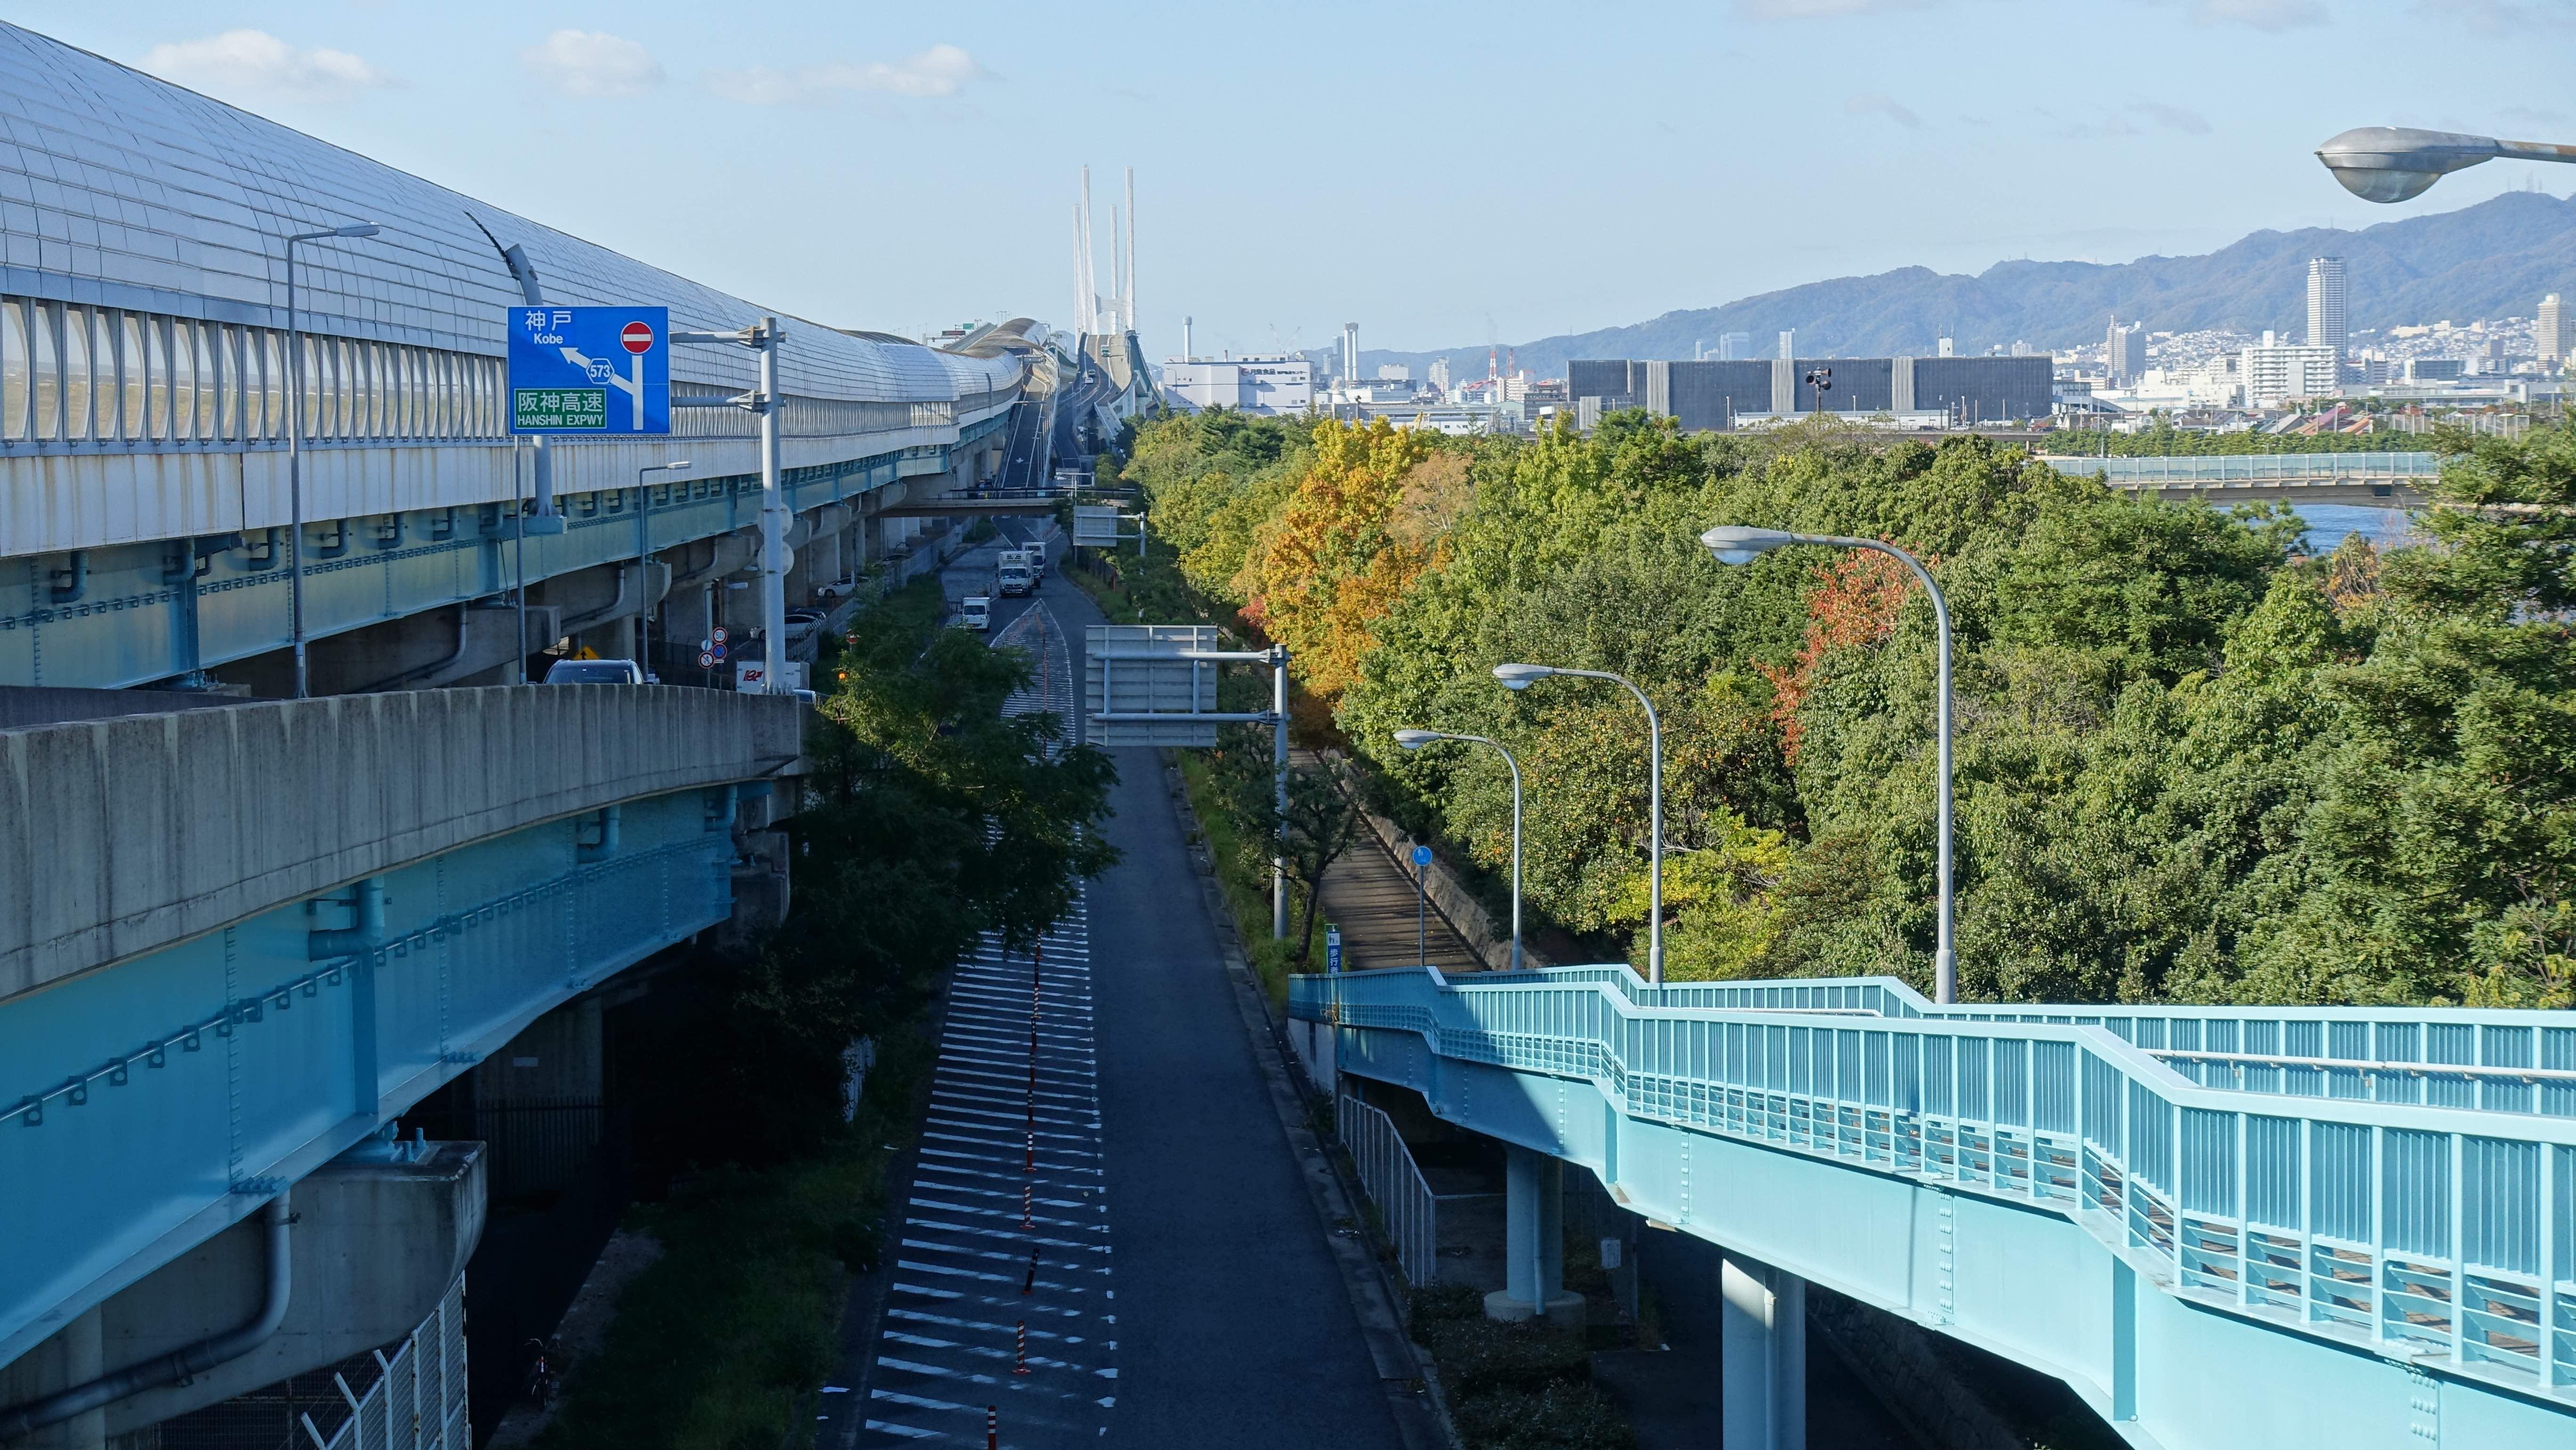 https://cdn-ak.f.st-hatena.com/images/fotolife/s/shioshiohida/20191120/20191120101638_original.jpg